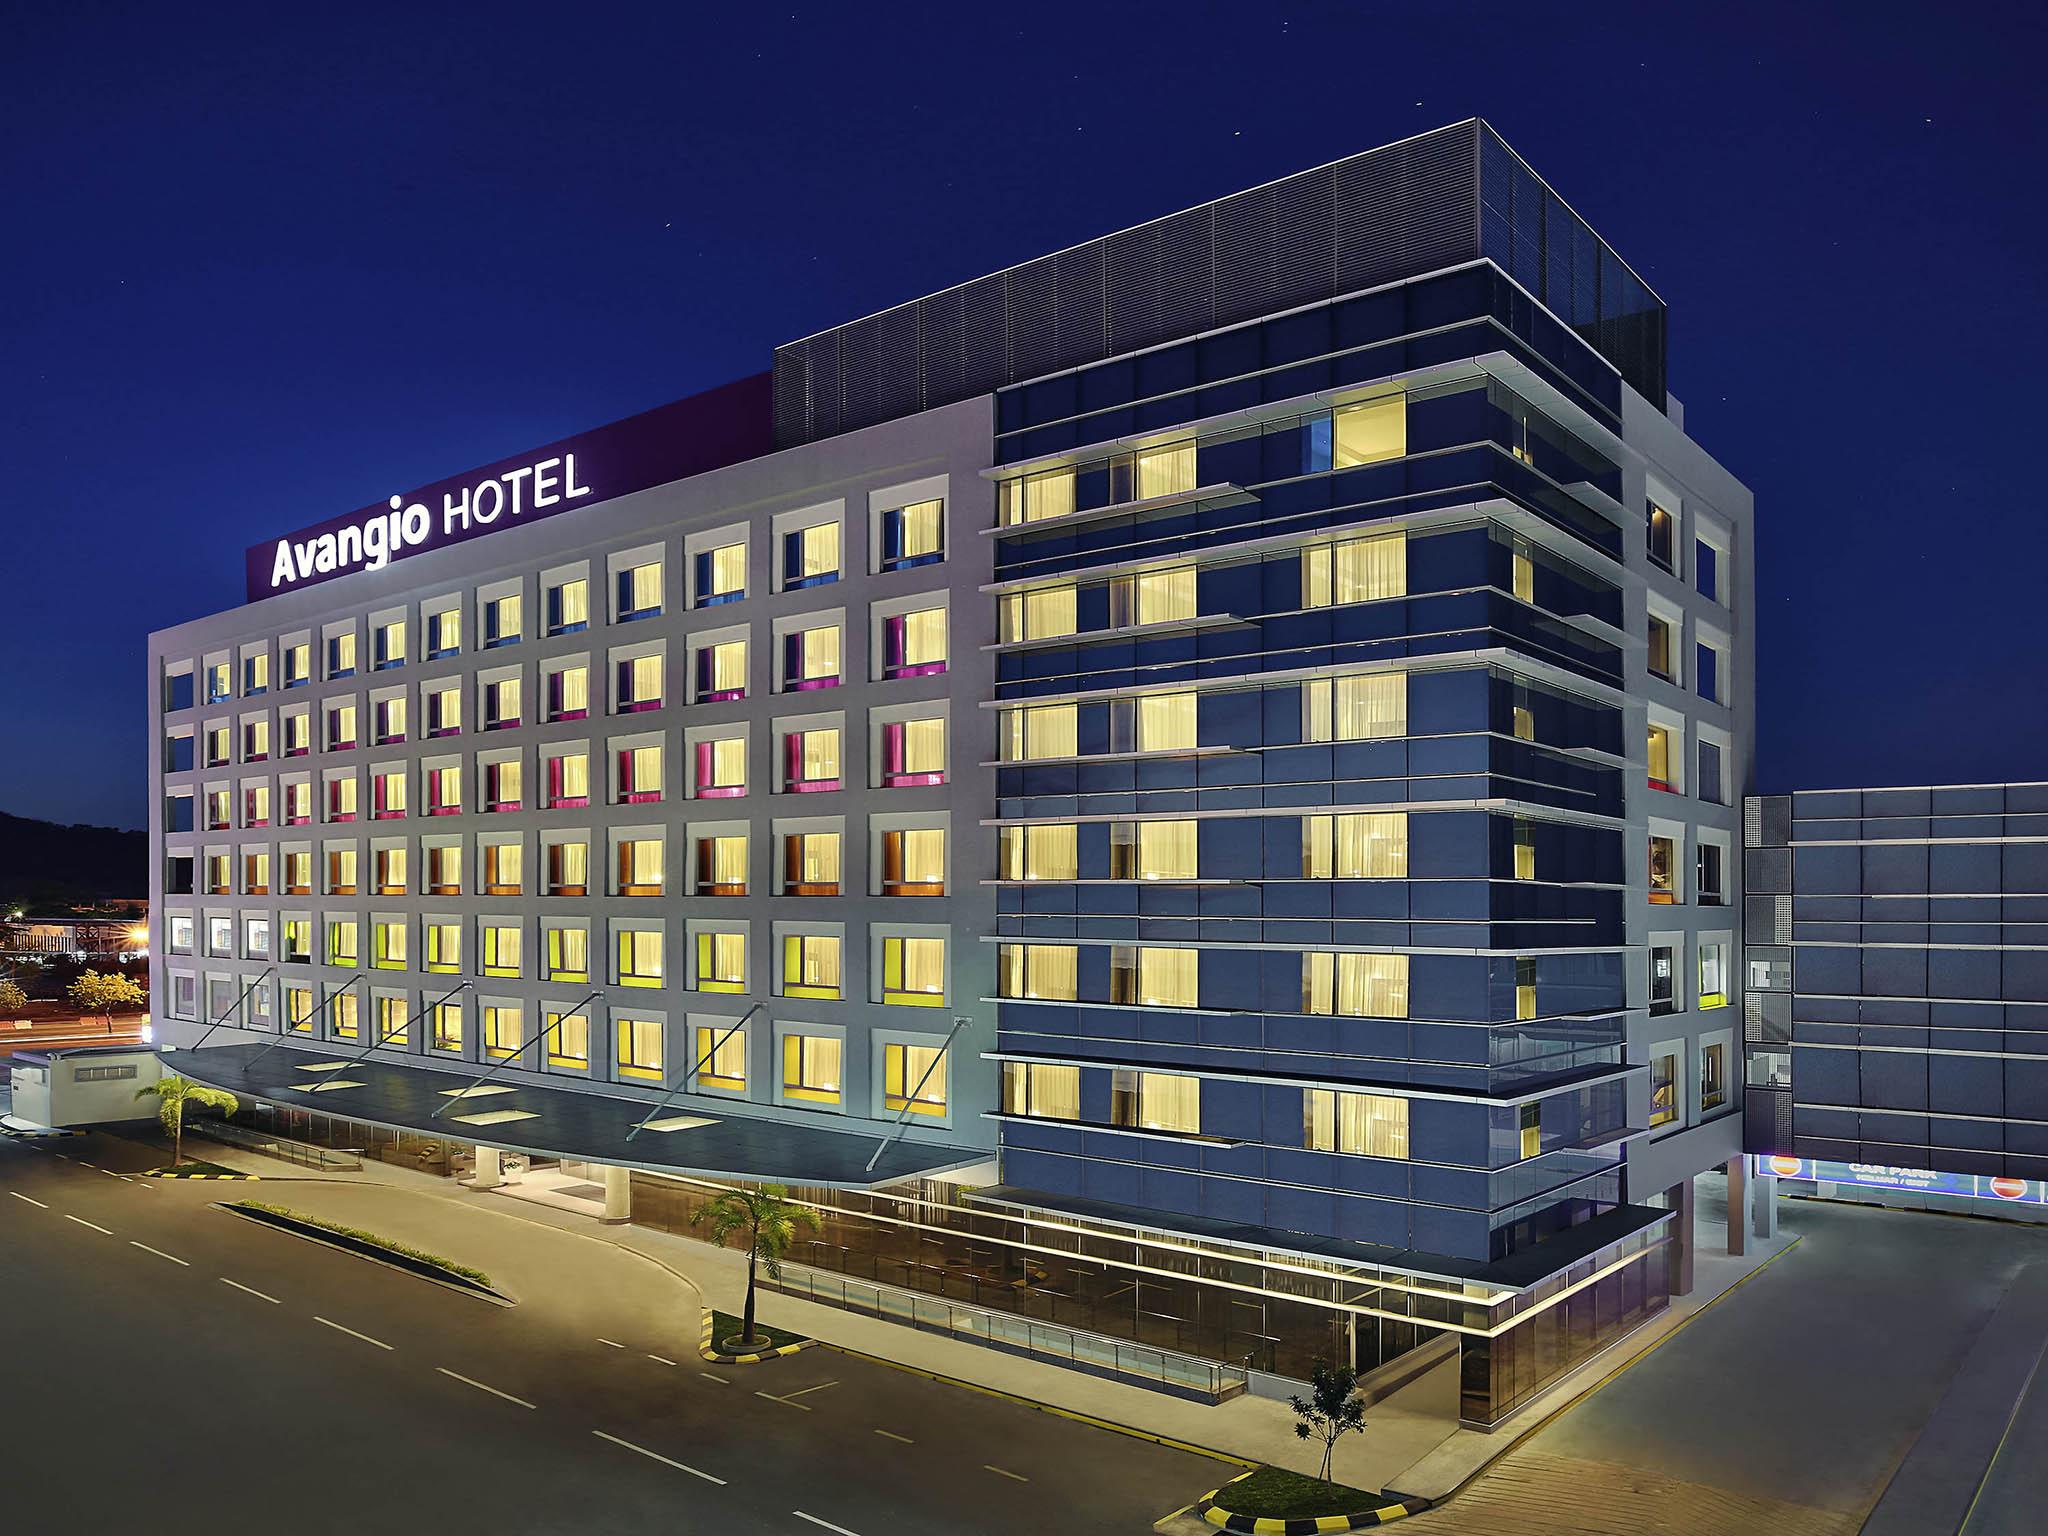 Hotel – Avangio Hotel Kota Kinabalu - grupy AccorHotels